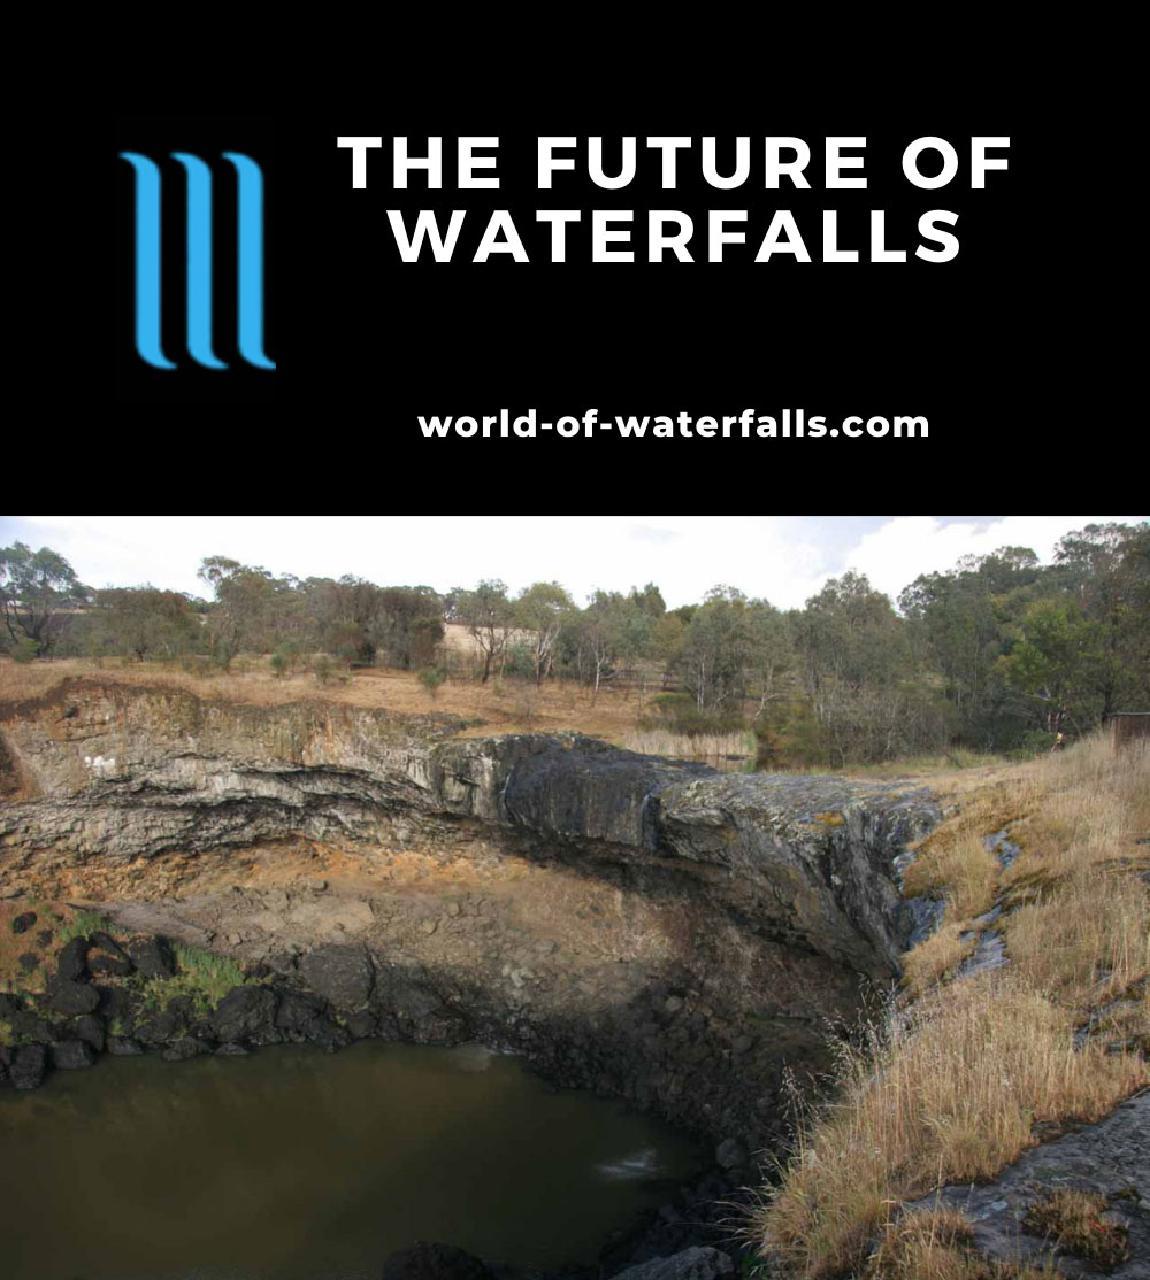 The Future of Waterfalls